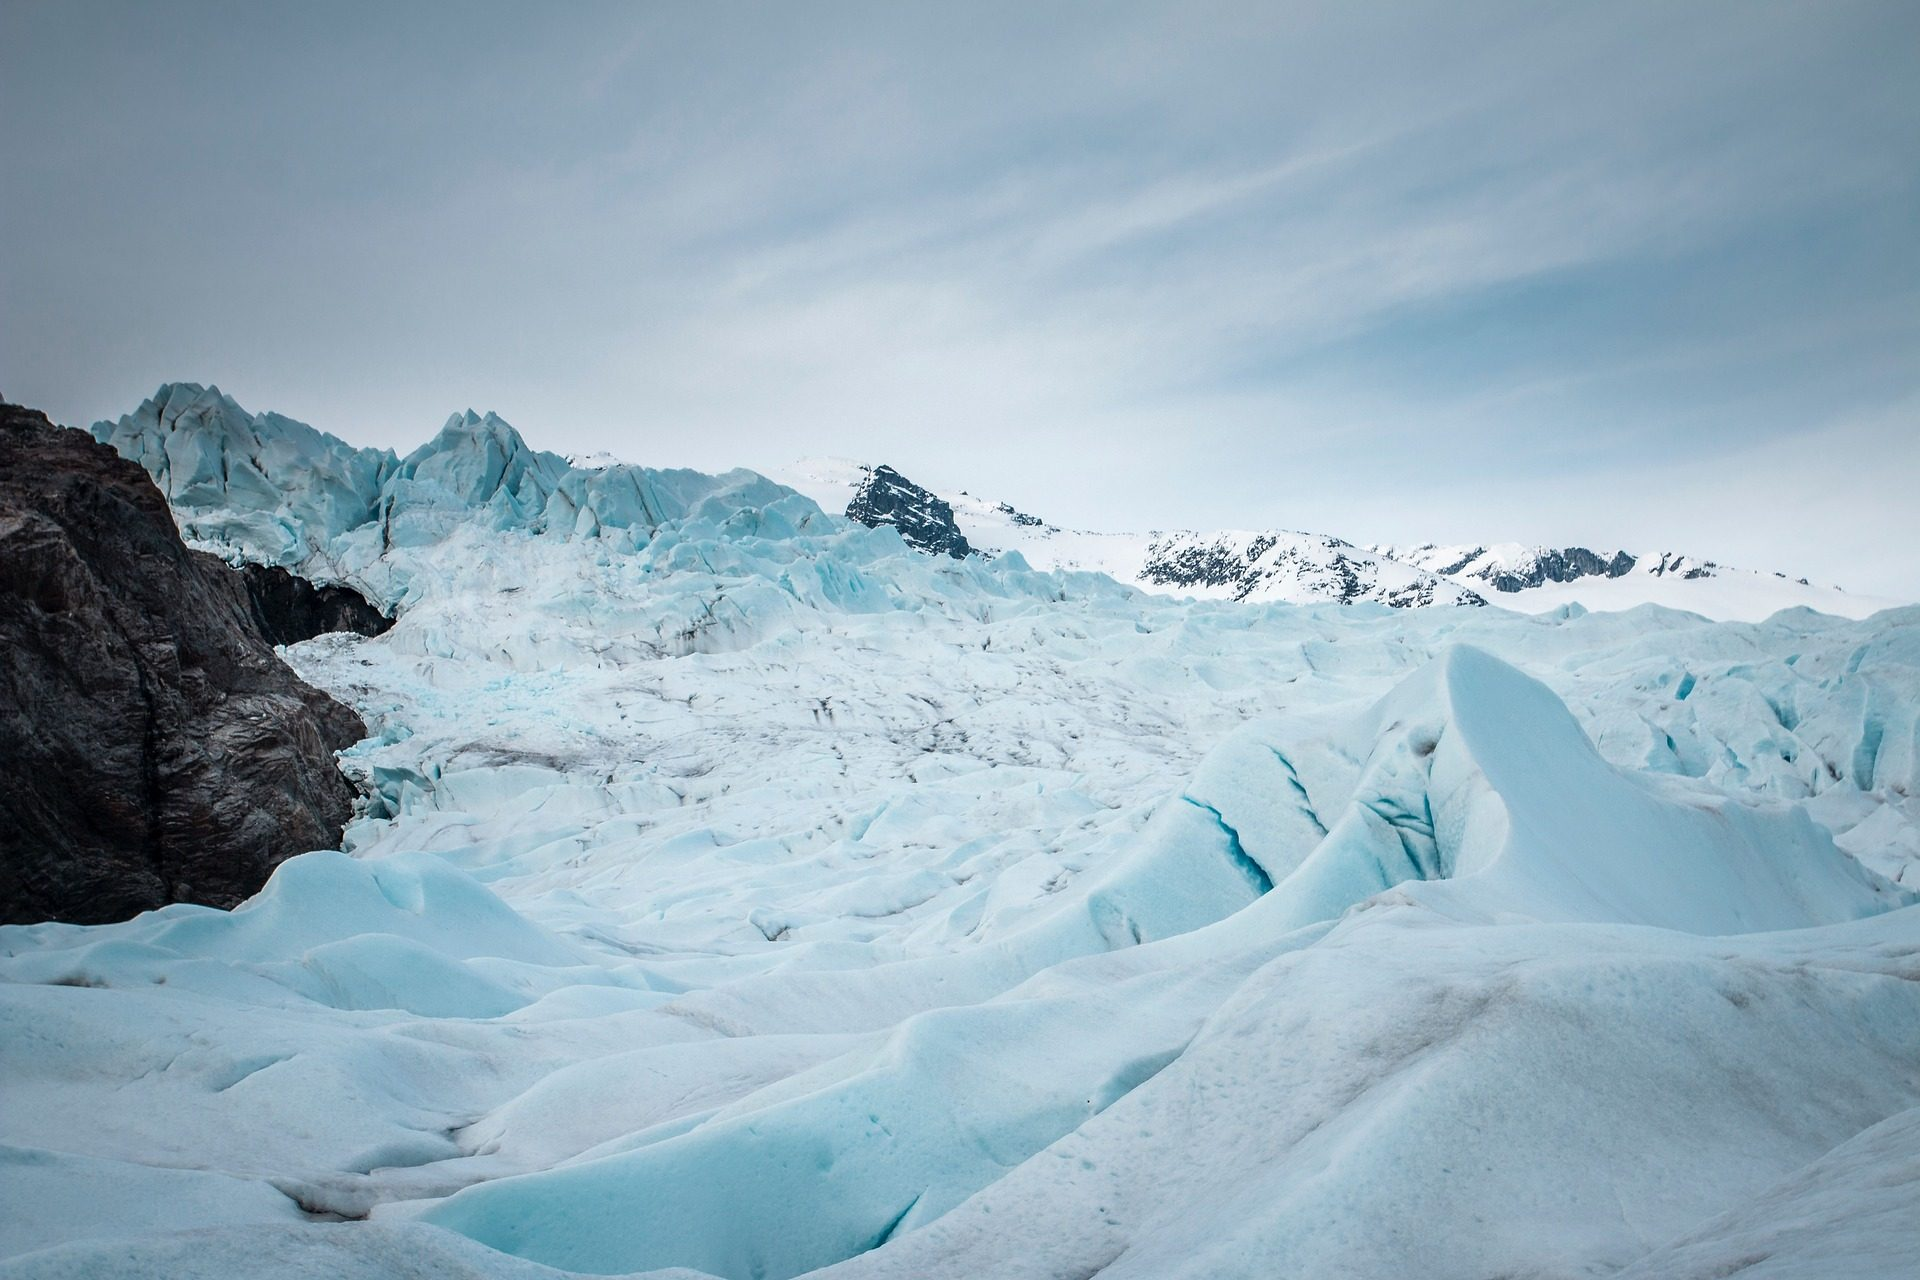 पहाड़, बर्फ, नेवादा, Rocas, बादल - HD वॉलपेपर - प्रोफेसर-falken.com